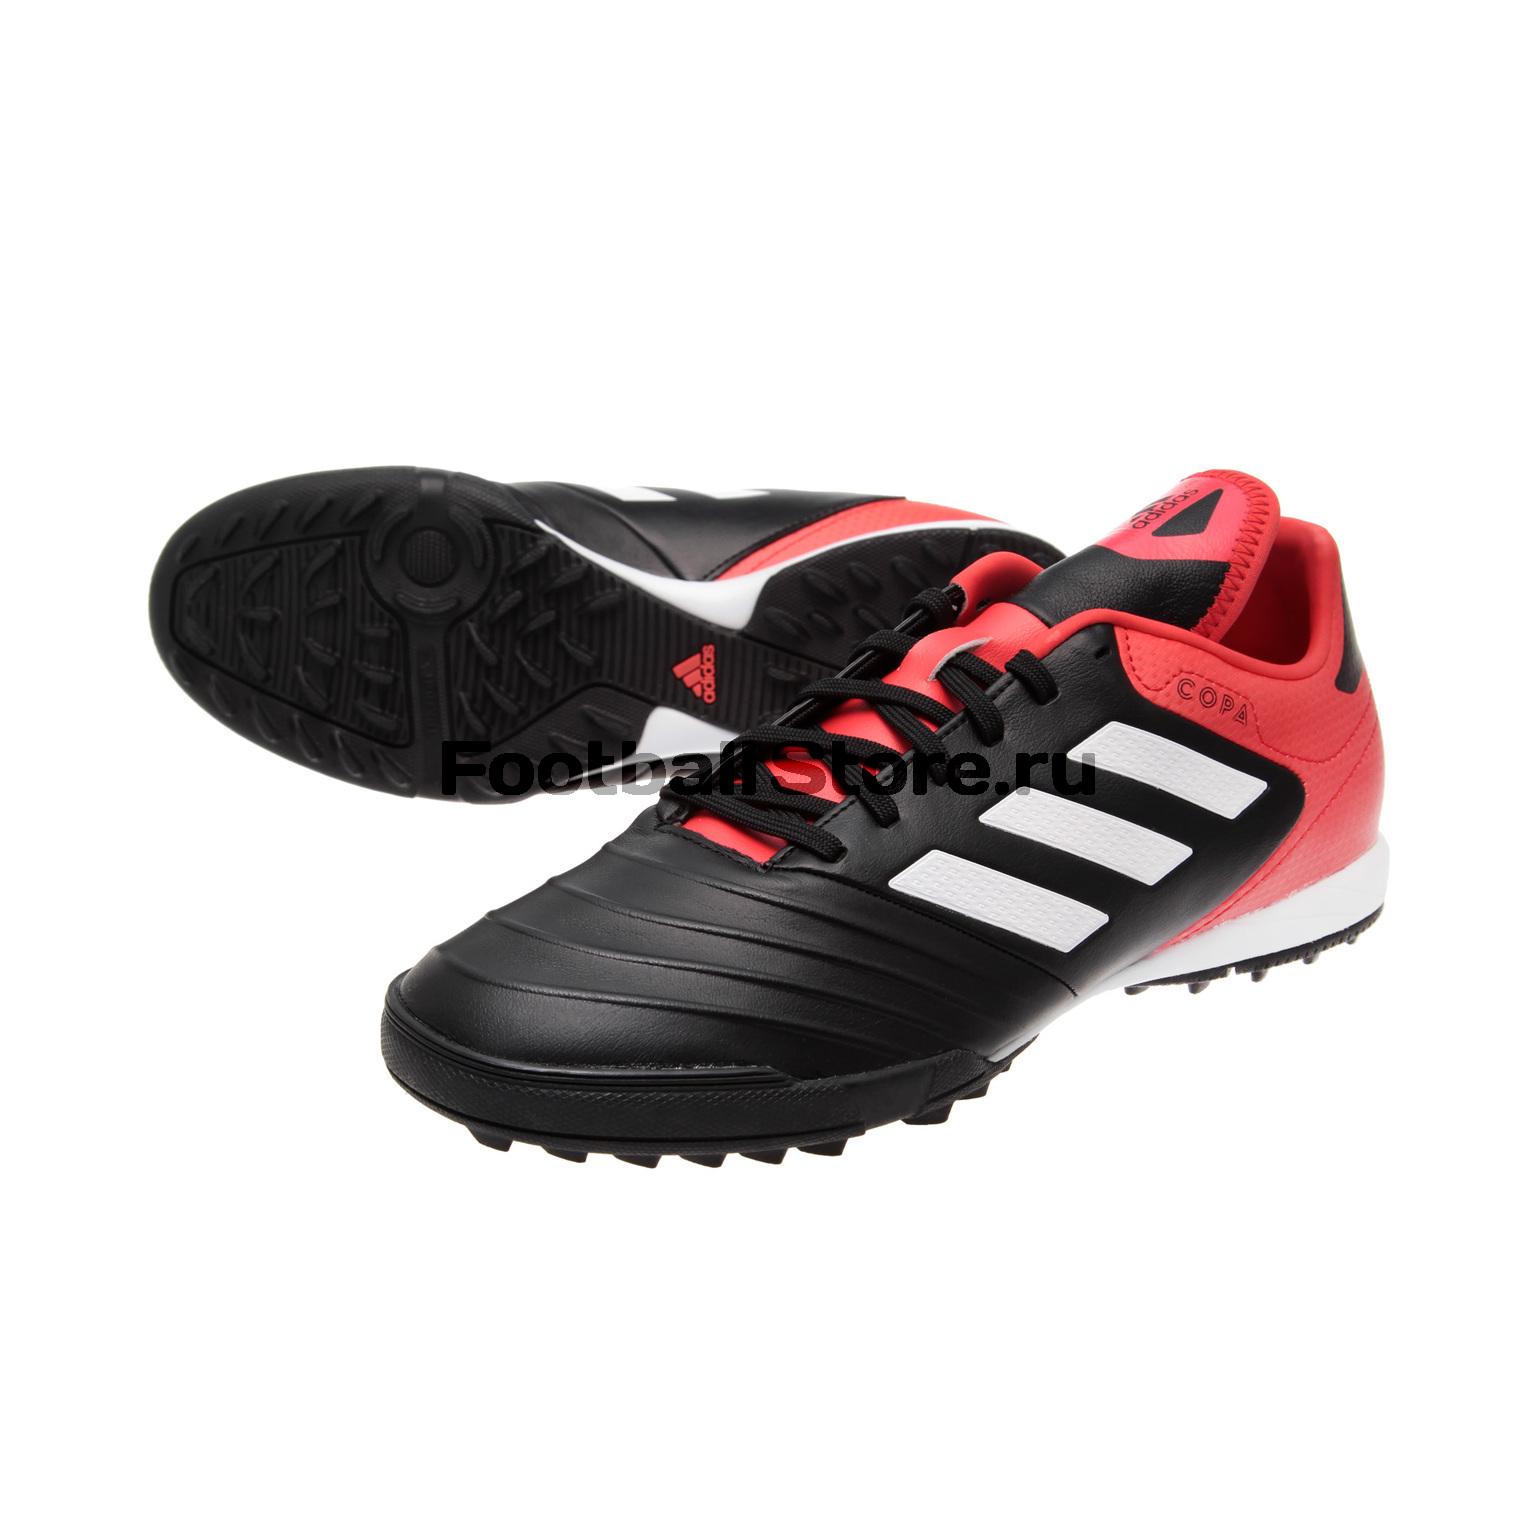 Шиповки Adidas Copa Tango 18.3 TF CP9022